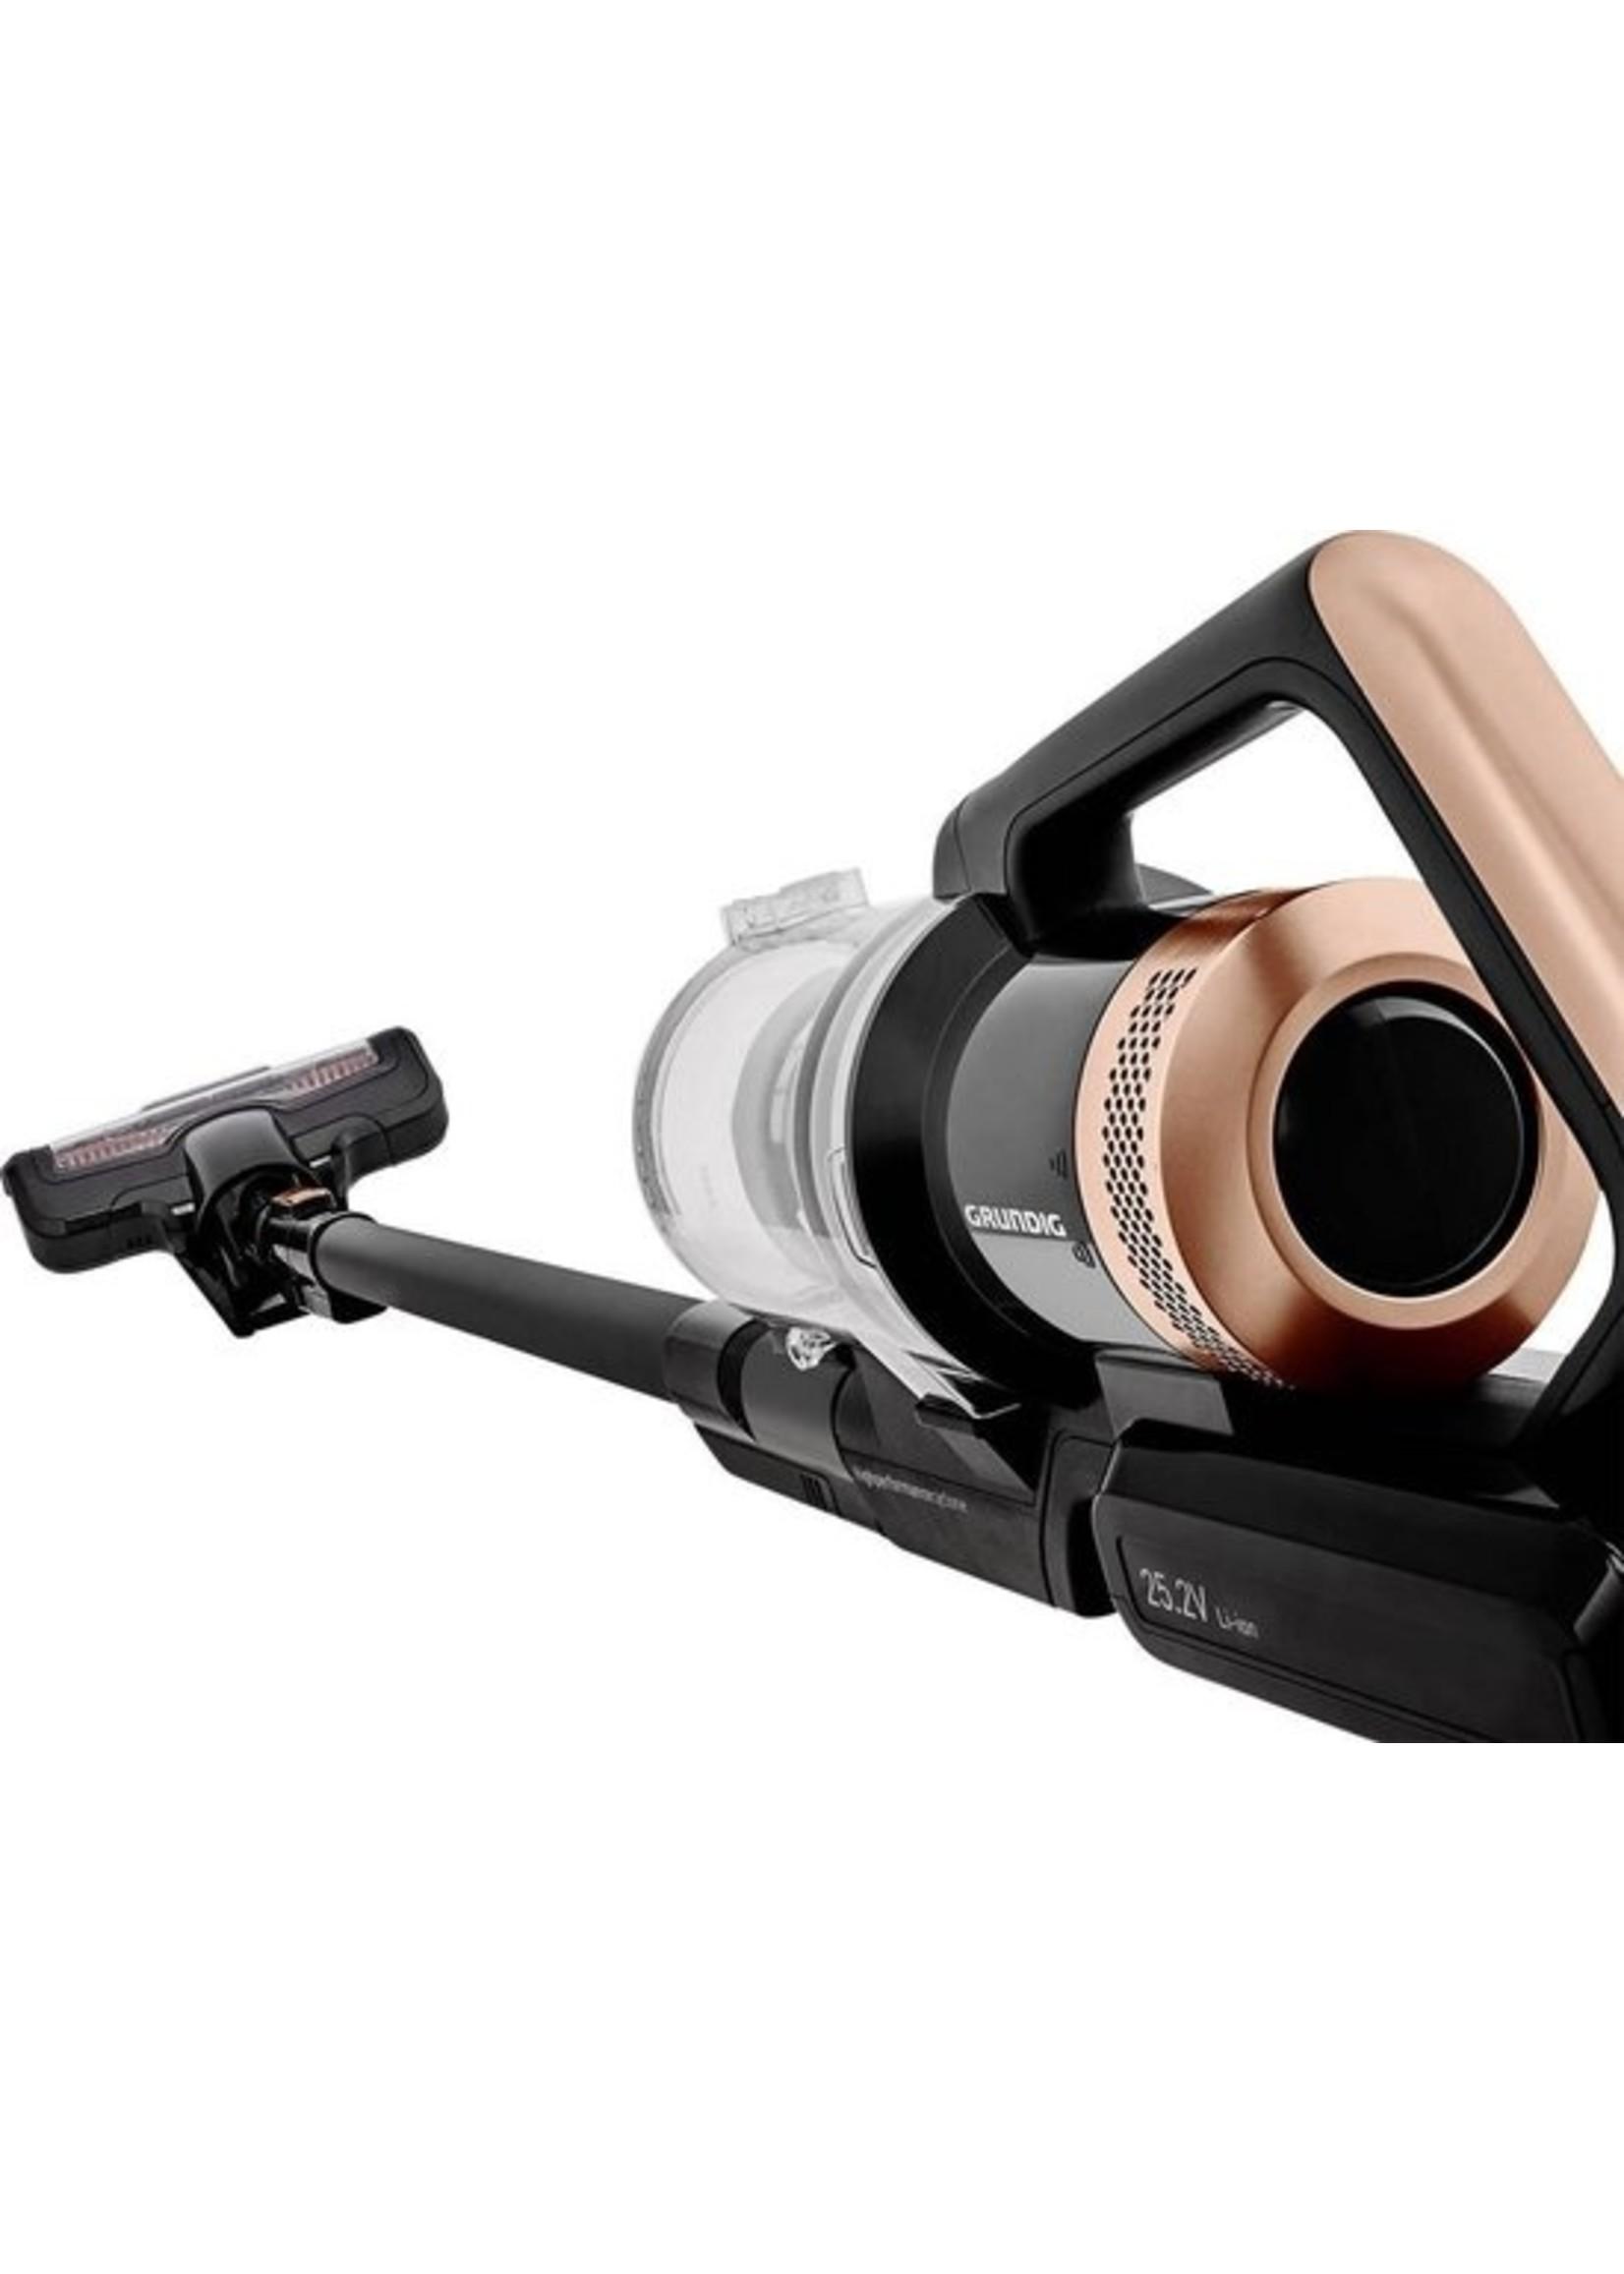 Grundig Grundig VCP 3930 Accu-handstofzuiger 25.2 V Zuigborstel met motor